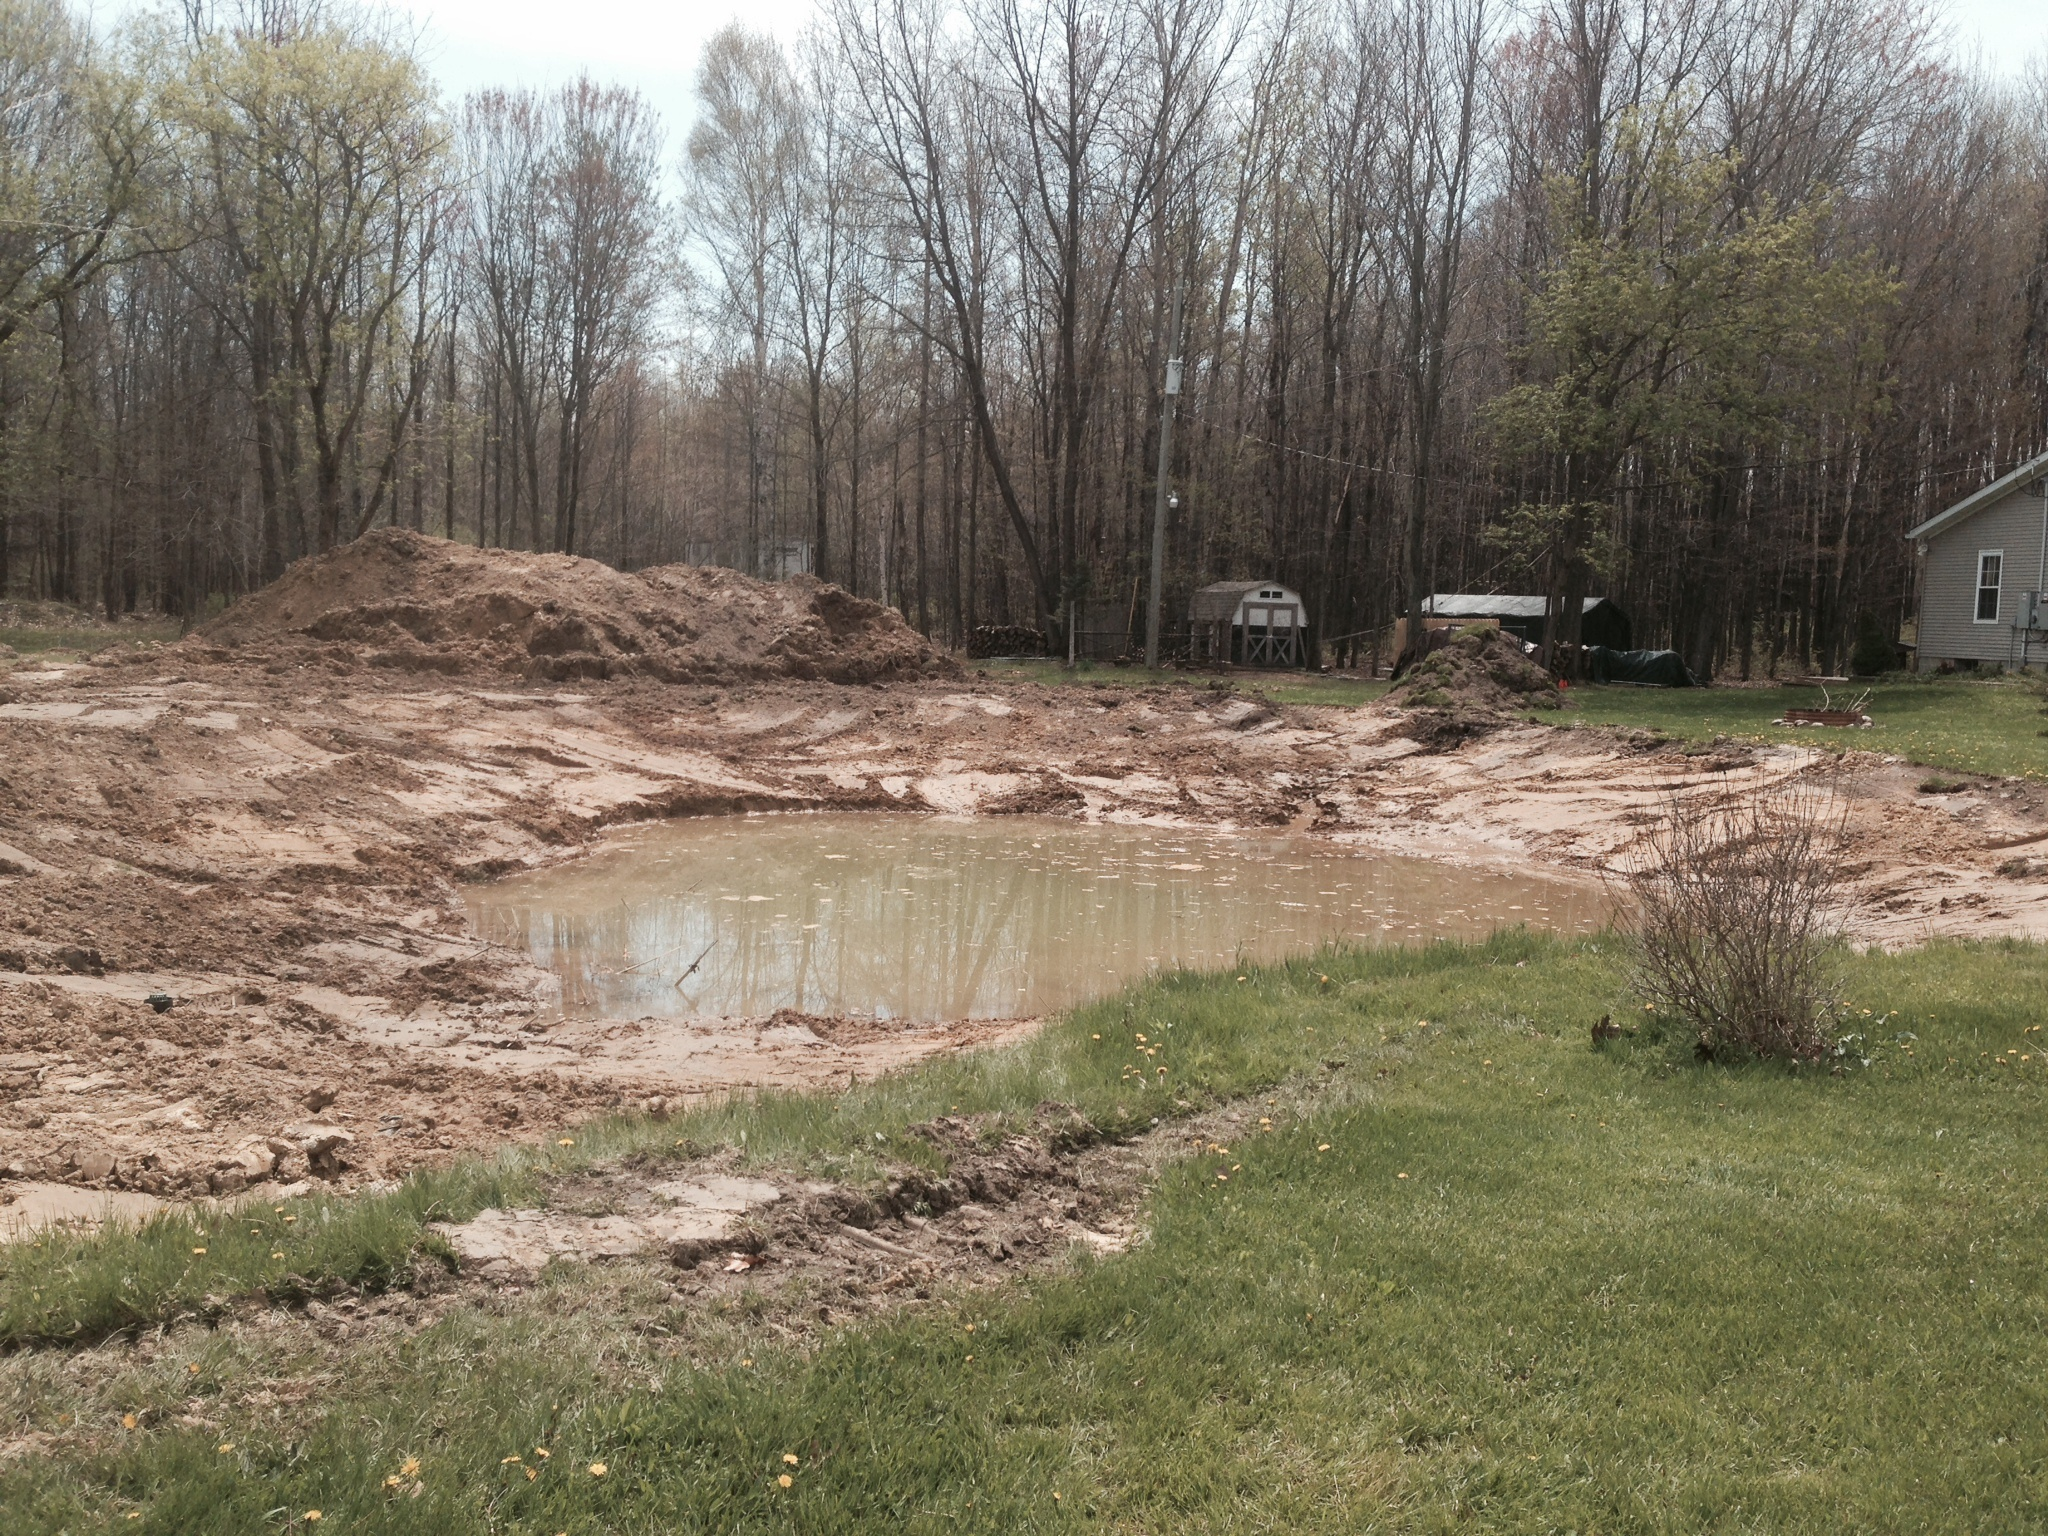 Pond_expansion_Michigan_Genesee_County_MI_____________________11.jpg